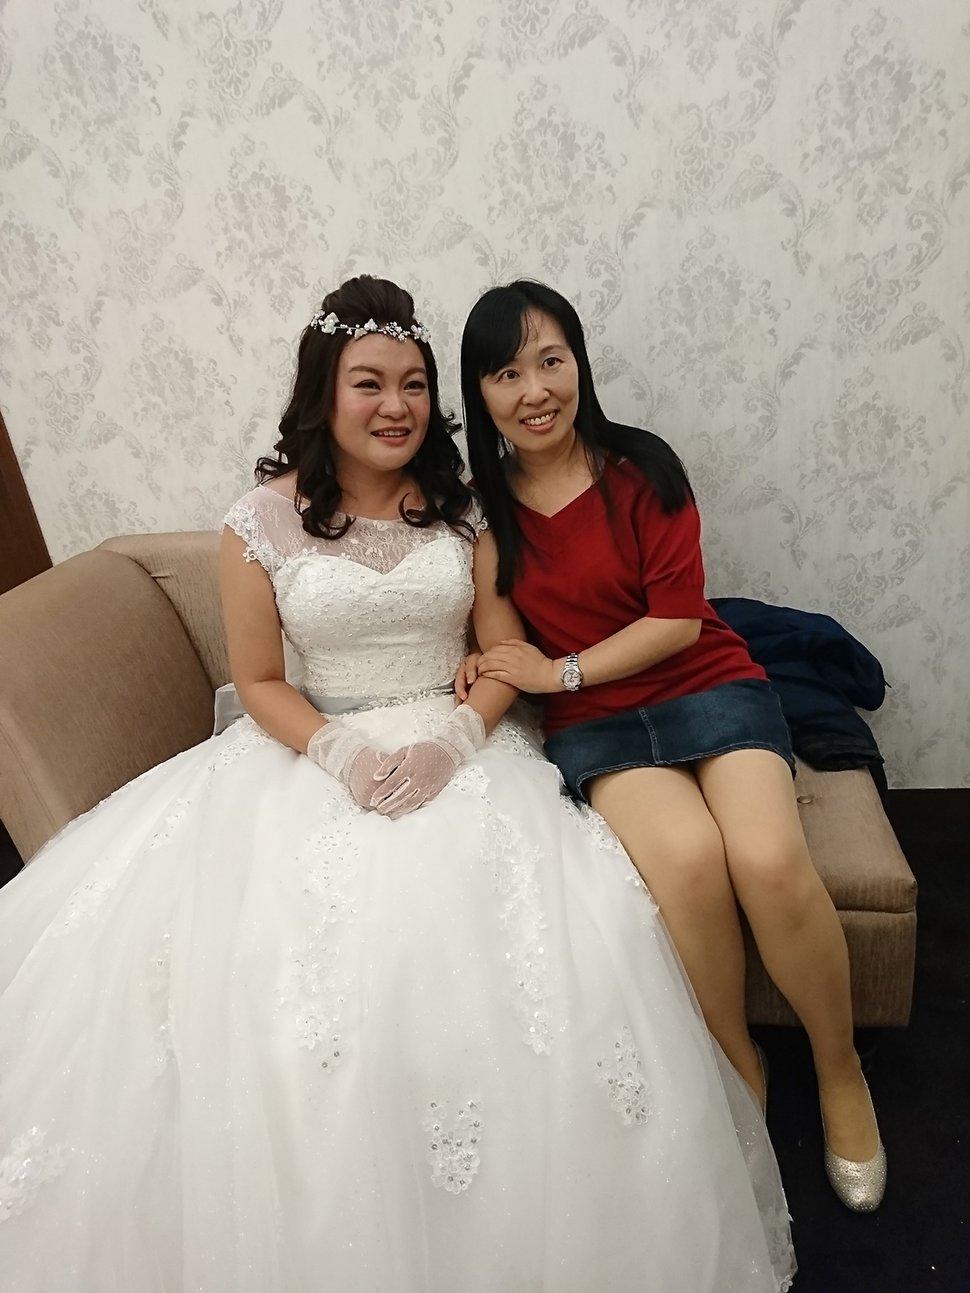 DSC_1824_mr1510538157297 - 陳靖  新娘秘書 - 結婚吧